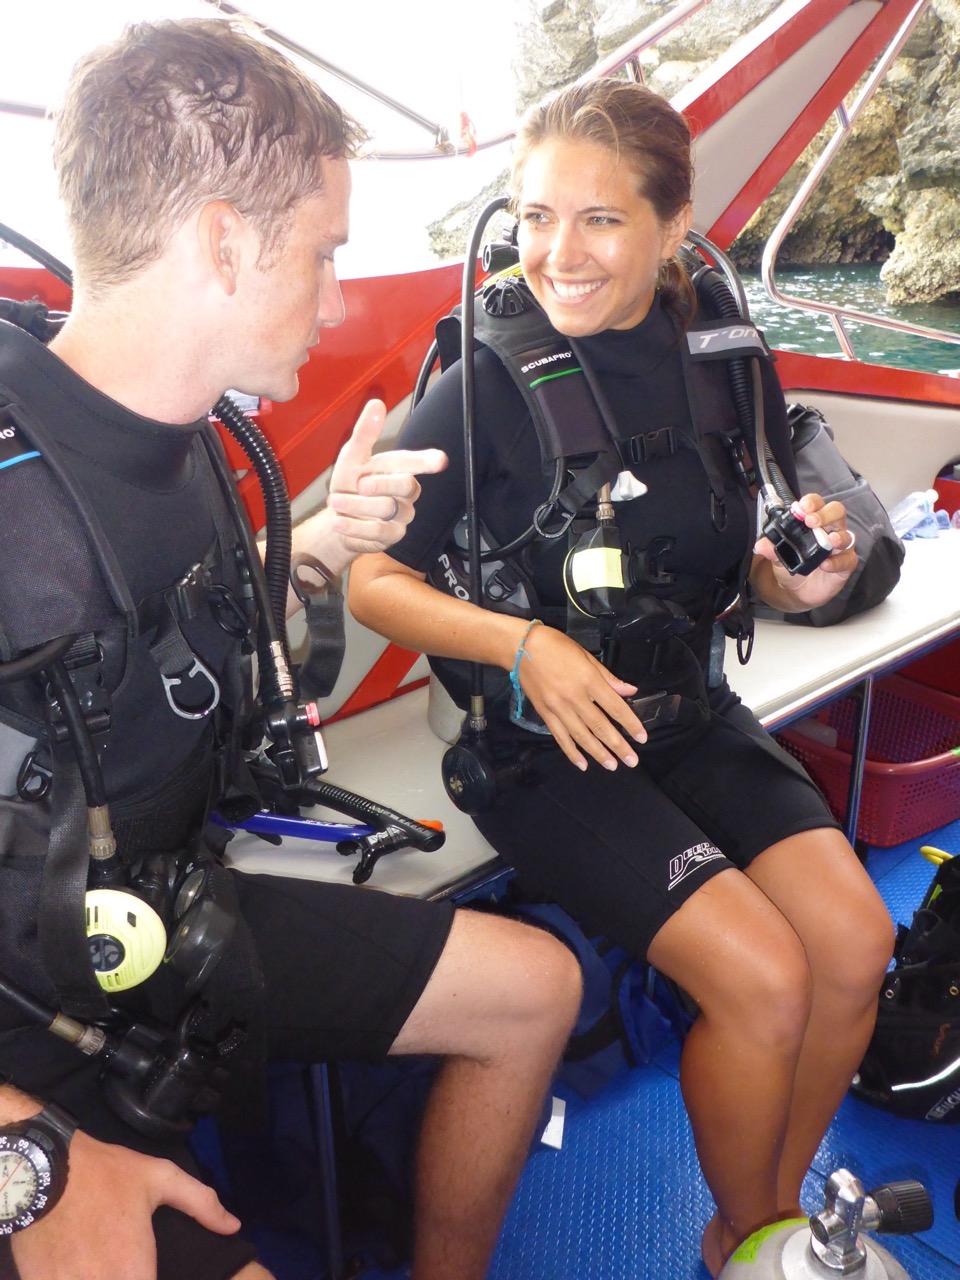 Scuba diving with Phoenix Divers - Koh Lanta, Krabi, Thailand